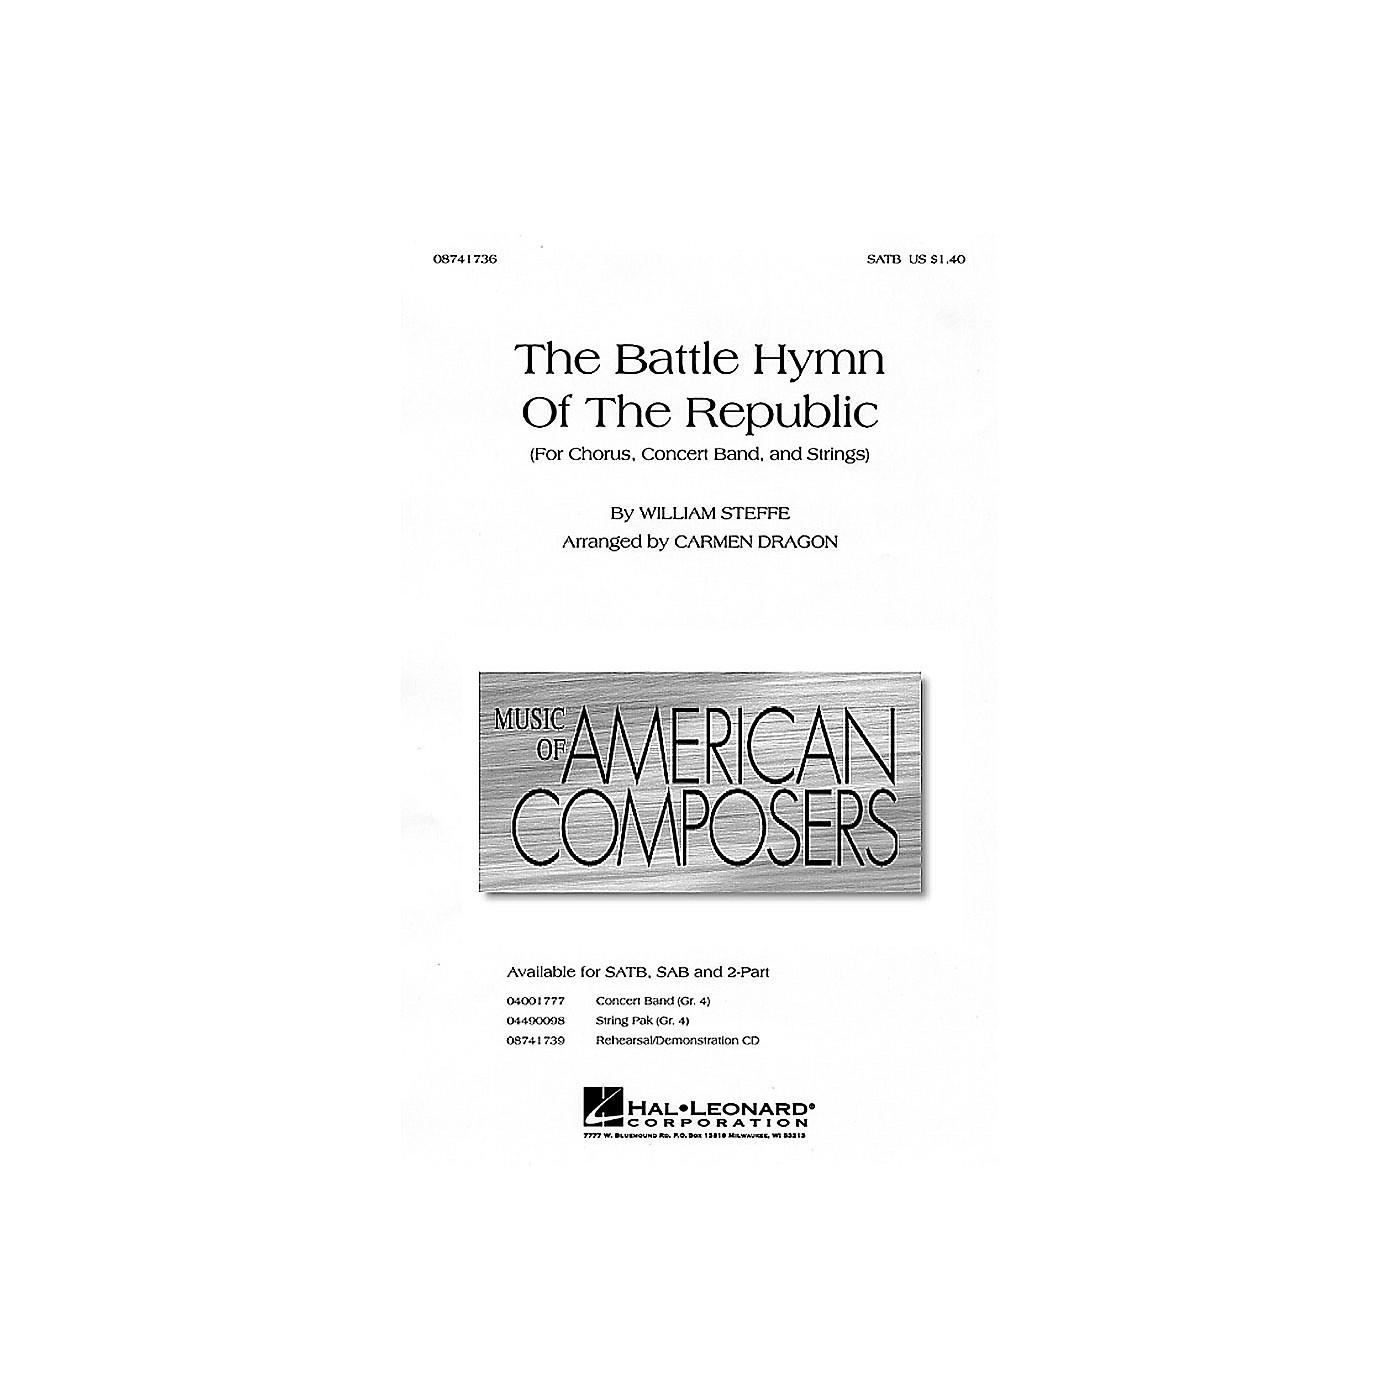 Hal Leonard The Battle Hymn of the Republic SATB arranged by Carmen Dragon thumbnail